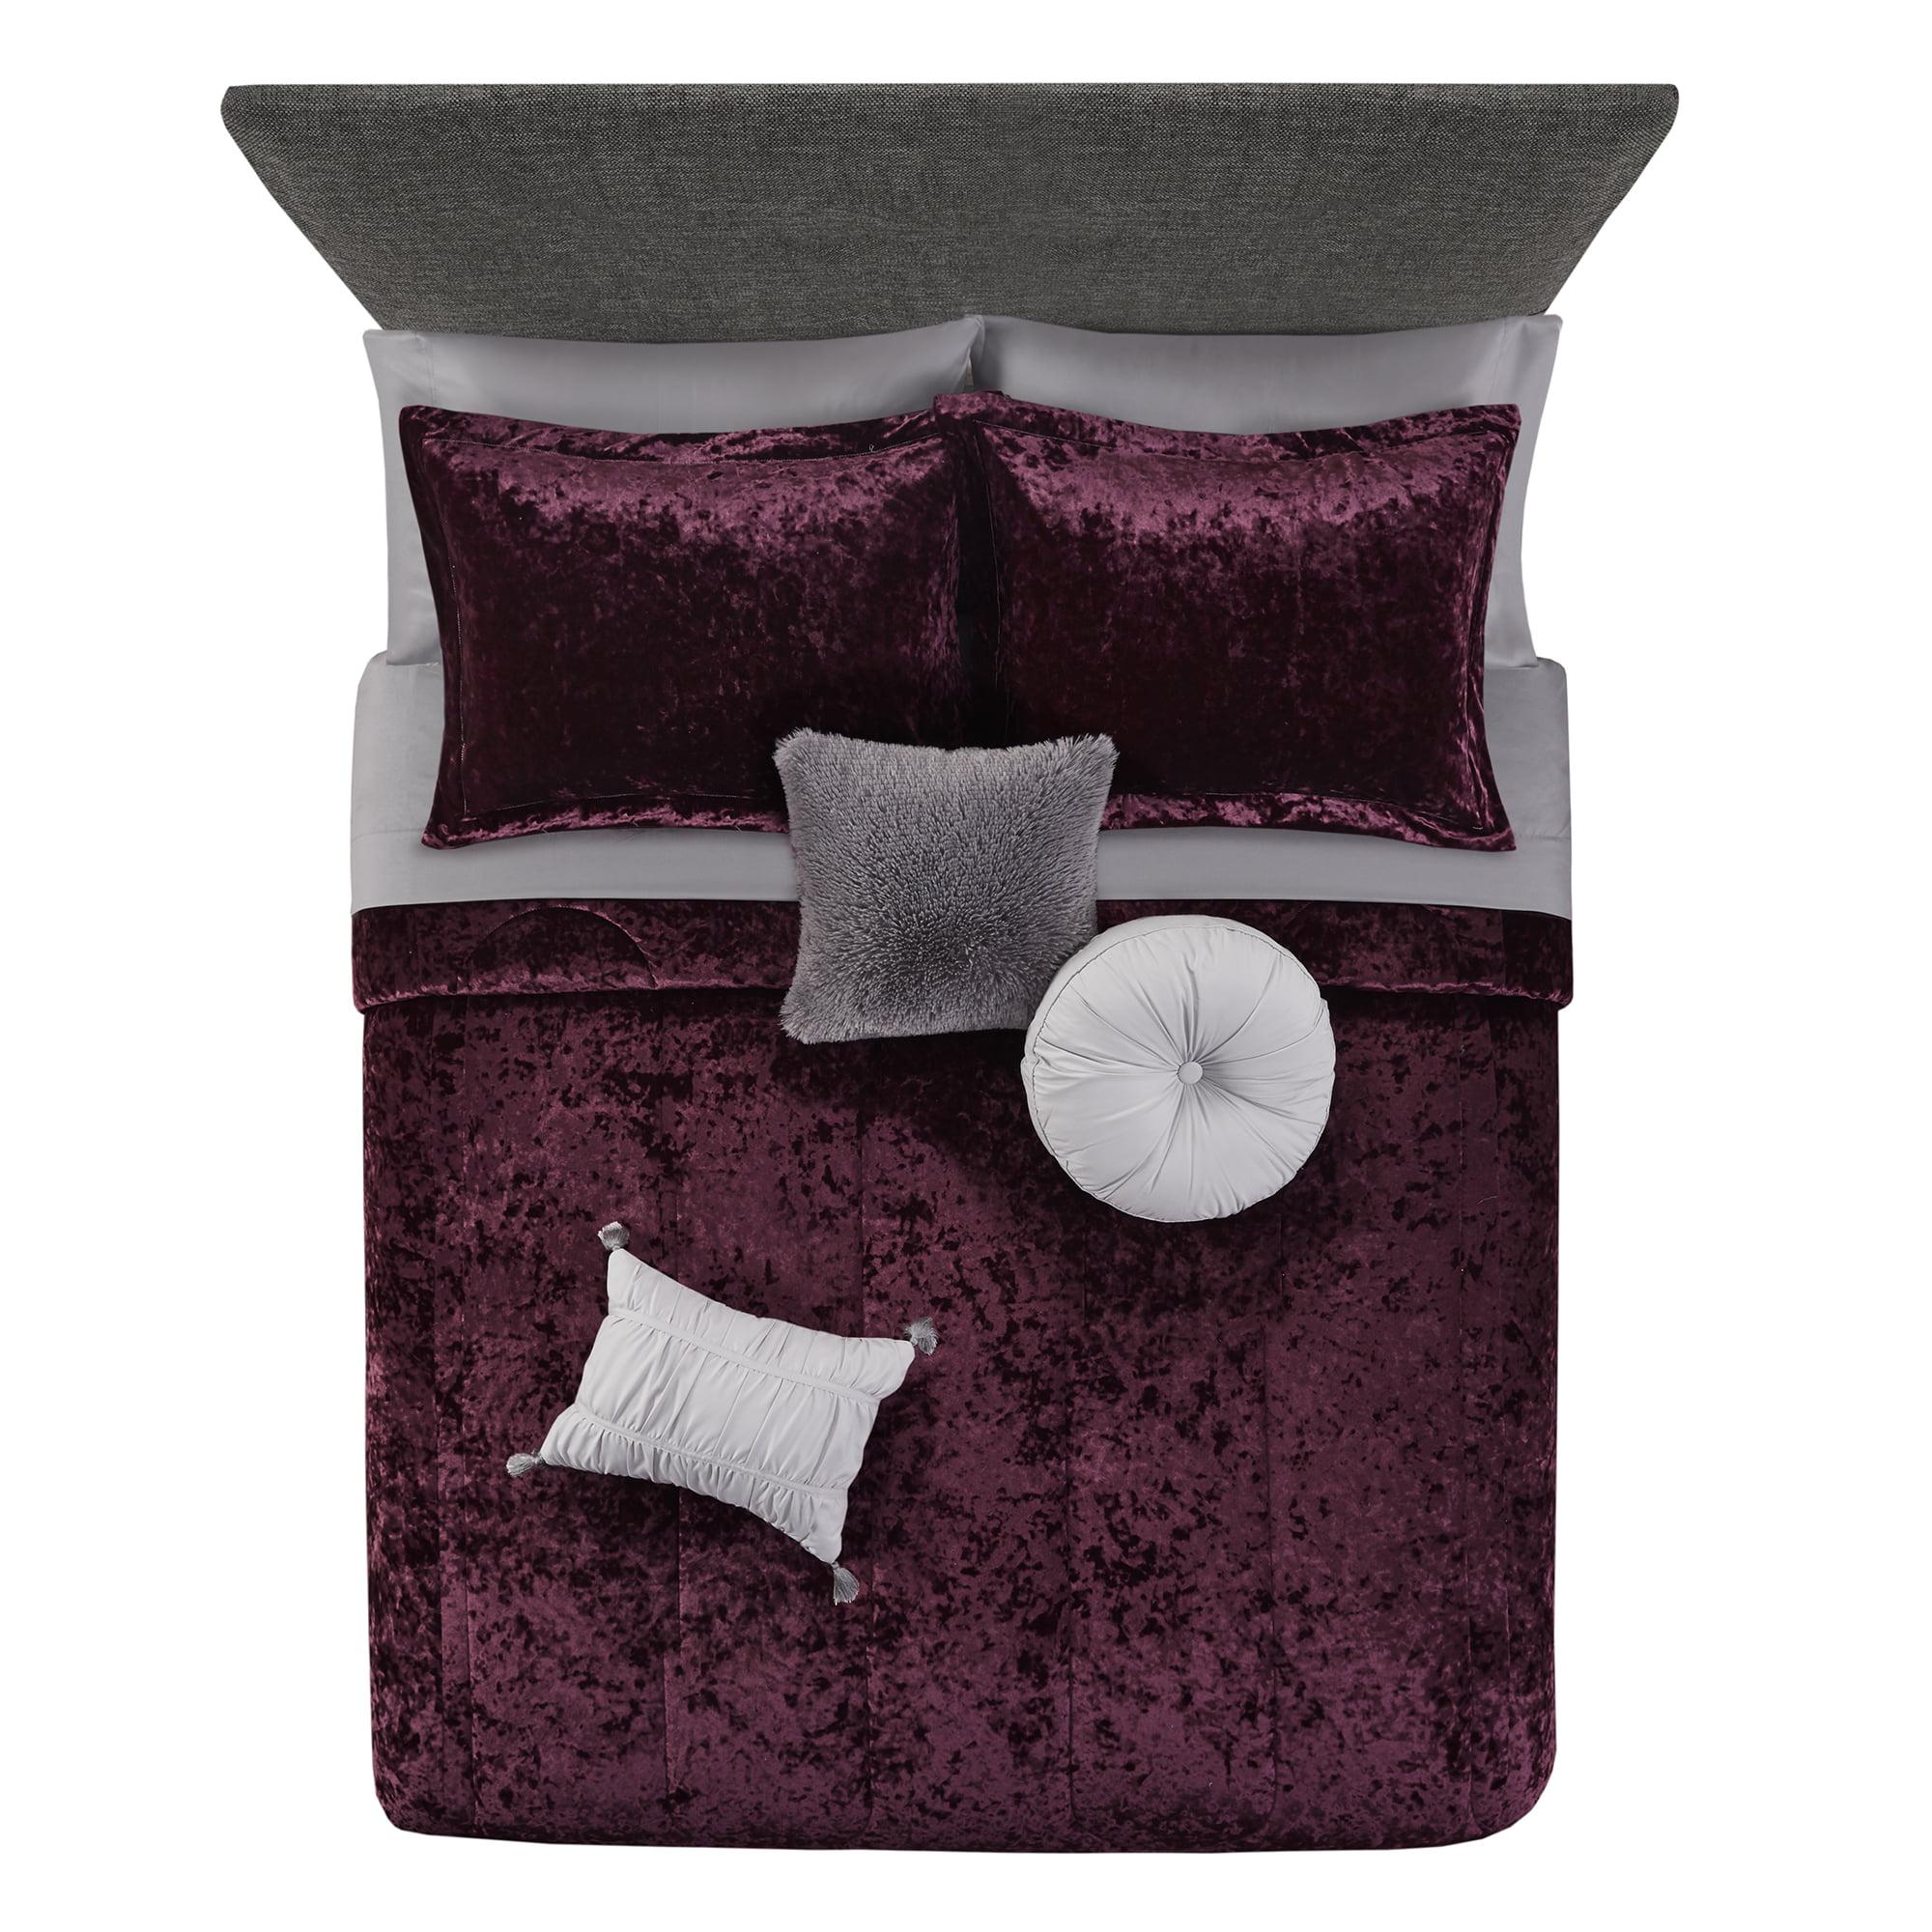 Mainstays Metropolis Velvet 10 Piece Bed In A Bag Bedding Set W Bonus Sheet Set Pillows Full Walmart Com Walmart Com